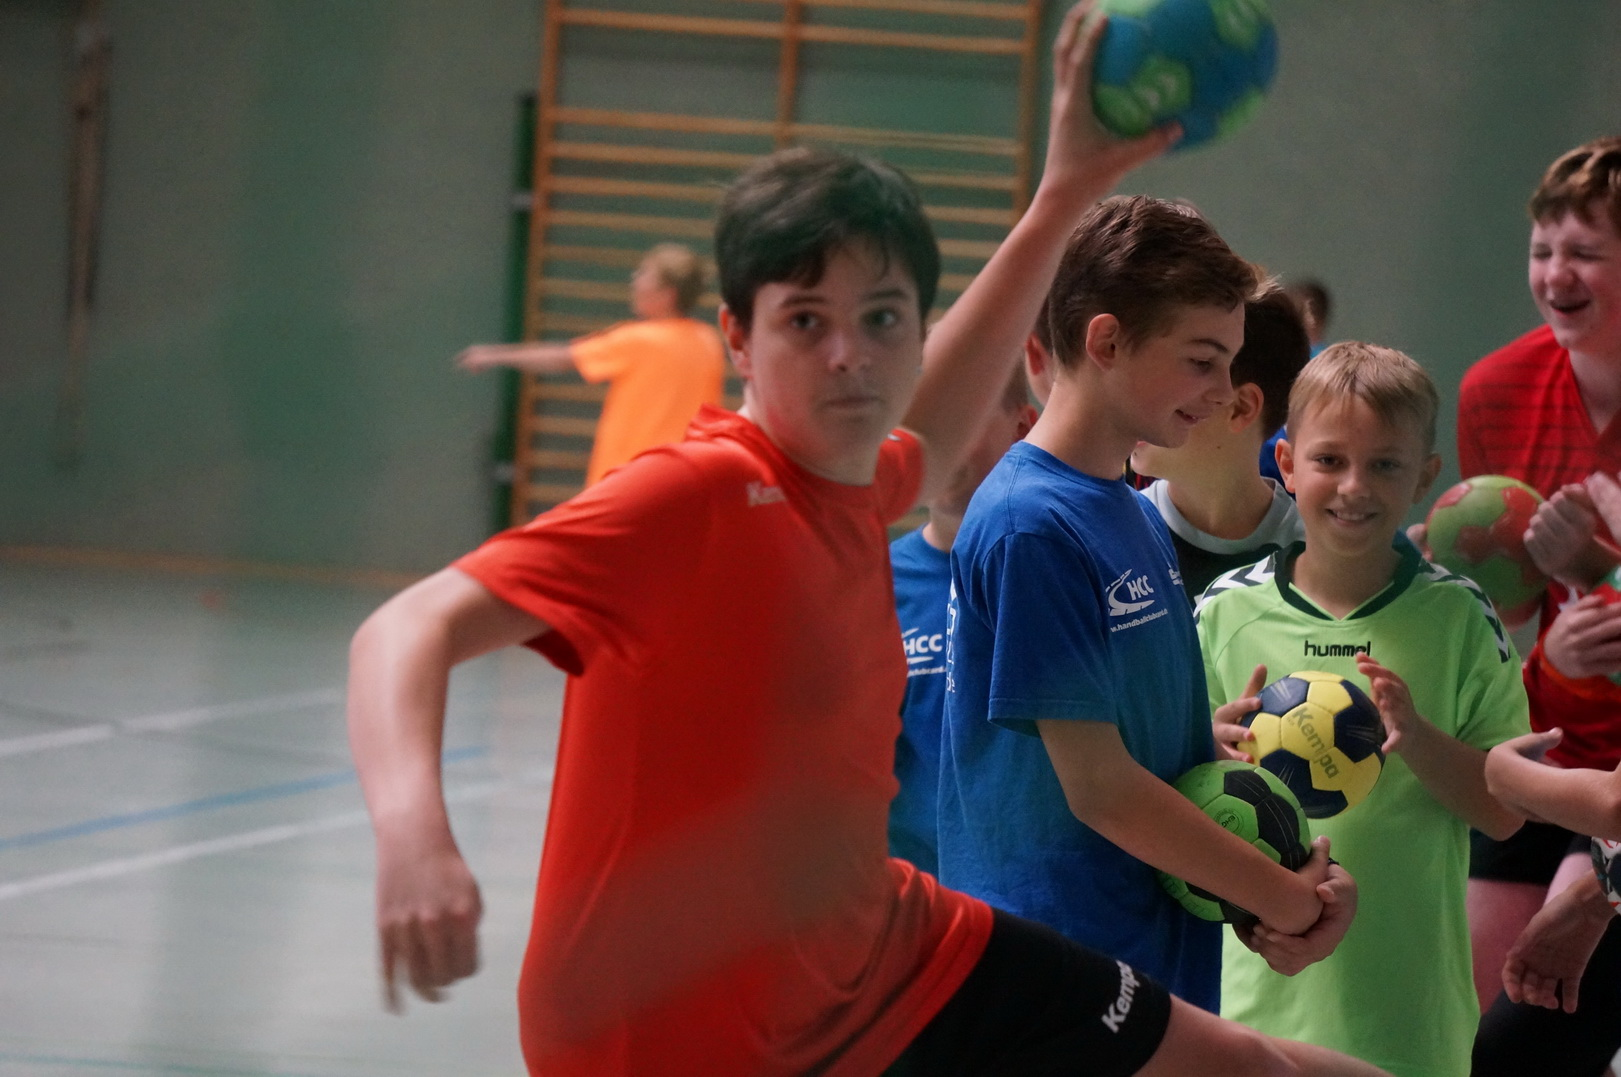 201808_Handballcamp_SDH_MG_136w